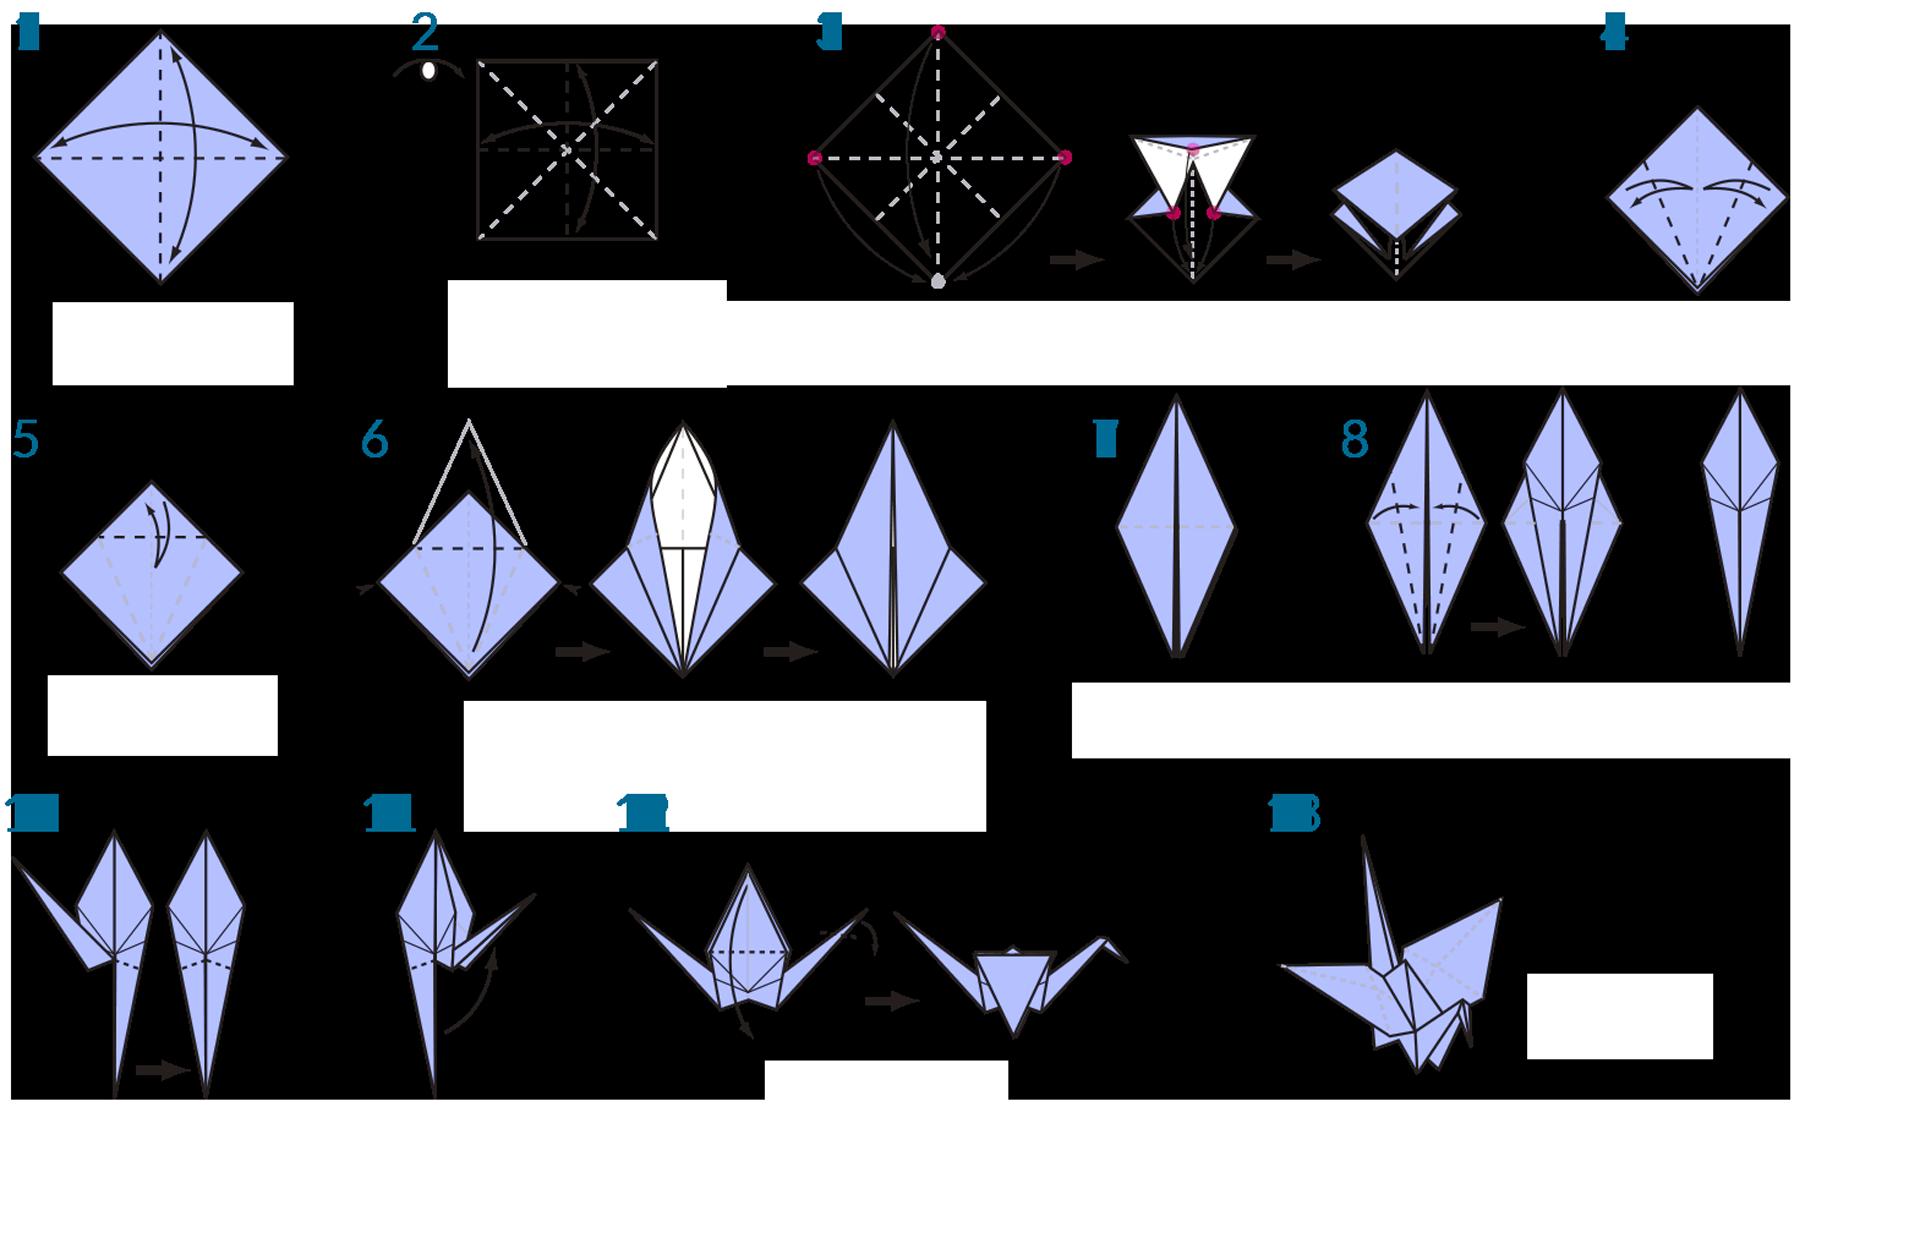 Origami Crane Instructions Origami Swan Instructions Origami